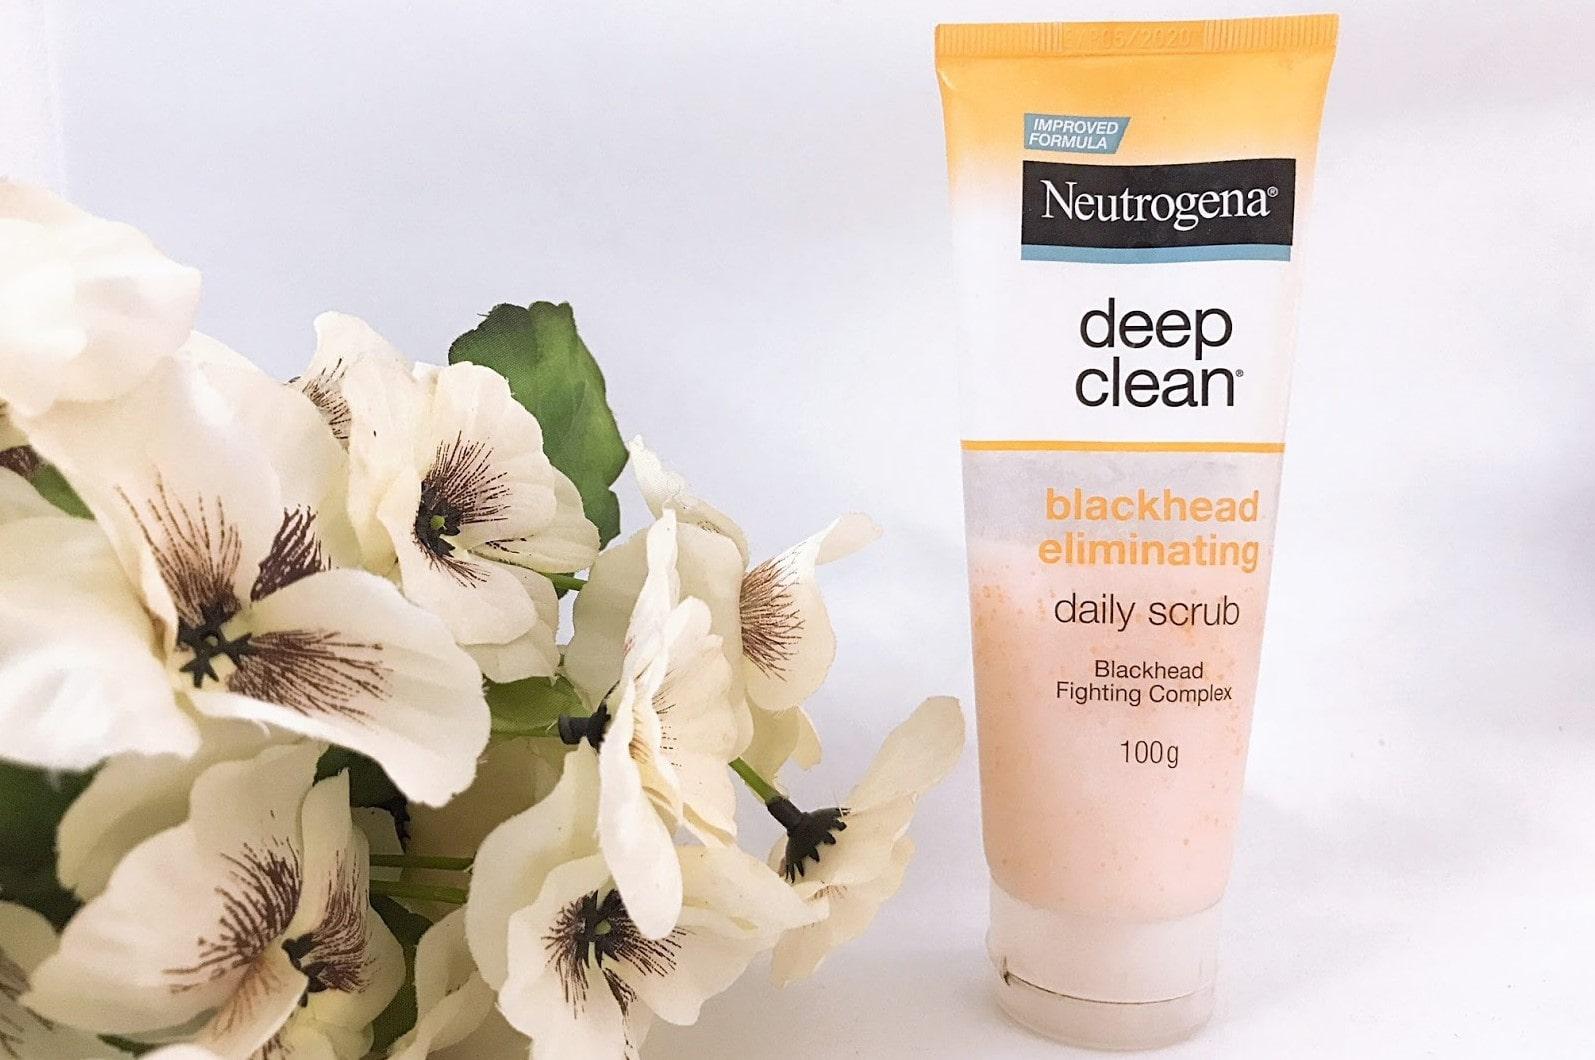 Neutrogena Deep Clean Blackhead Eliminating Daily Scrub | Best Face Scrub for Men